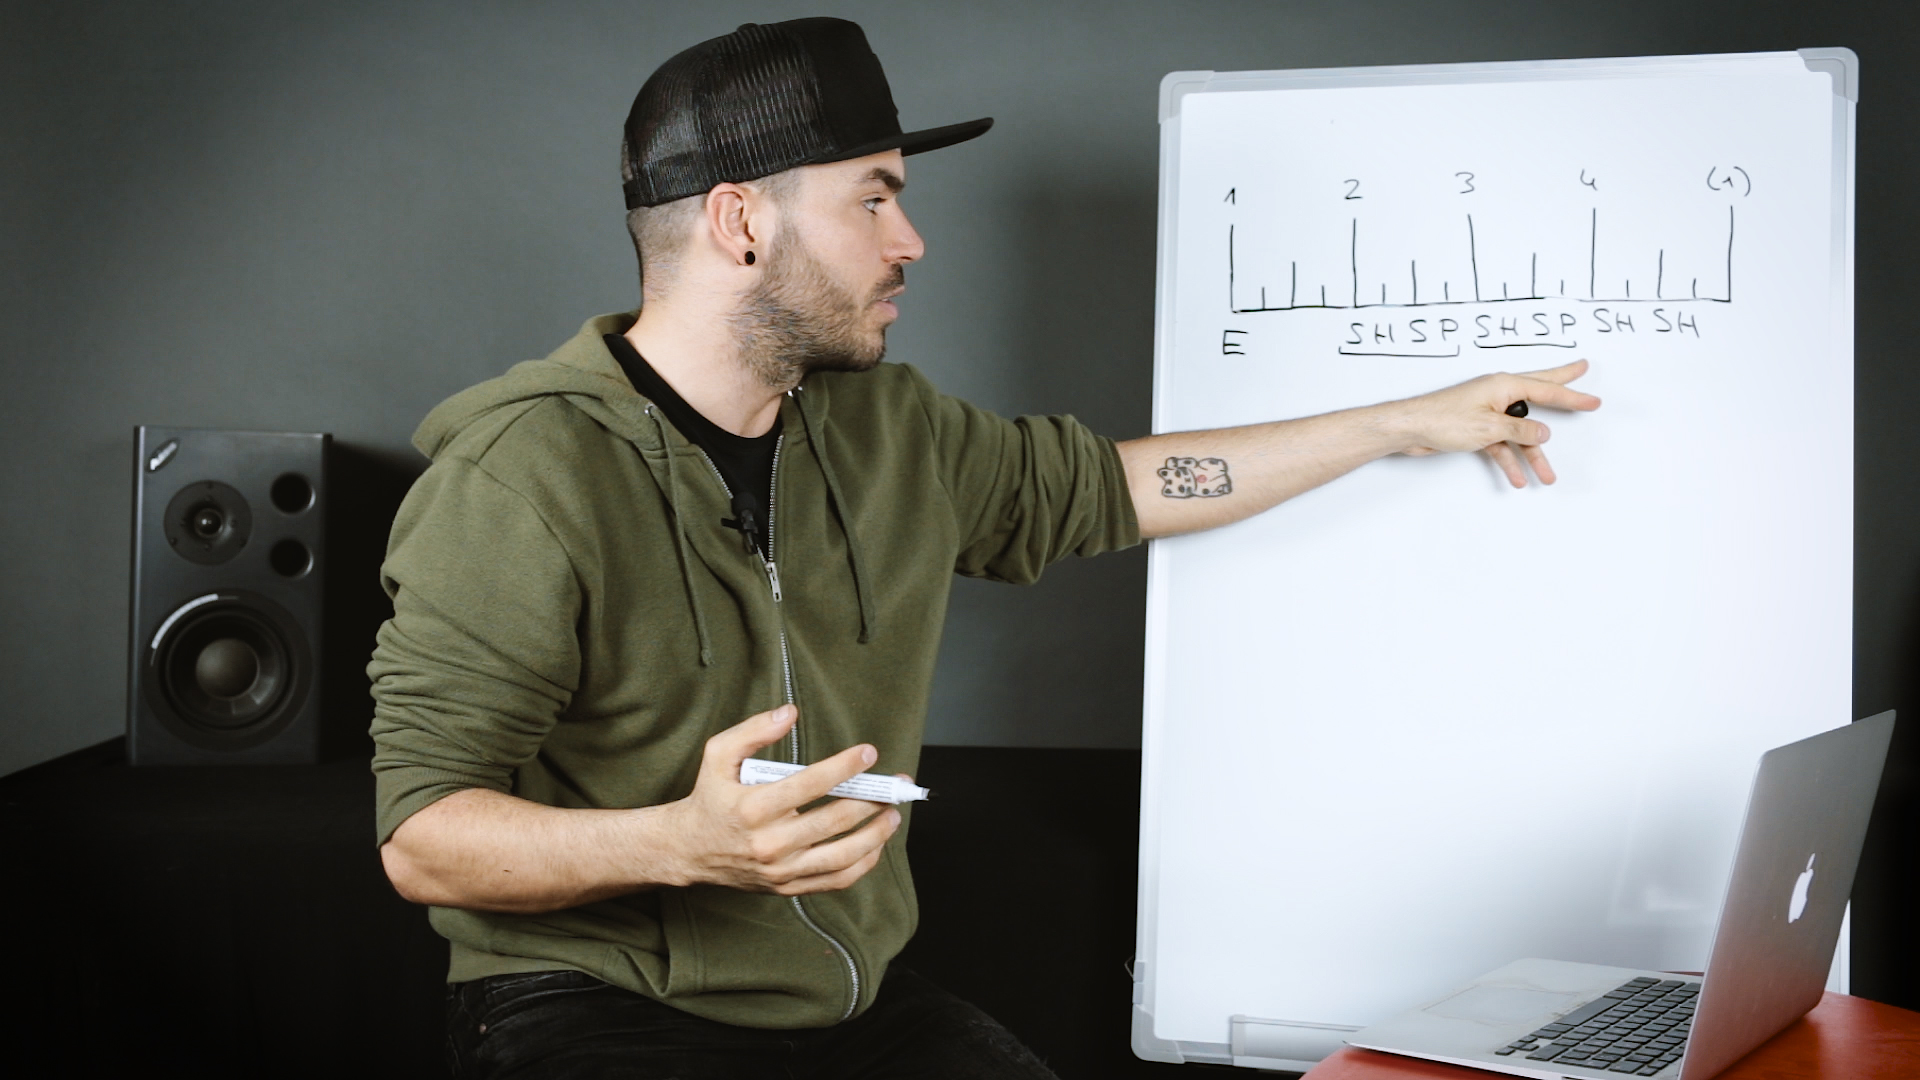 Creando patrones de slap a partir de células rítmicas (Parte 2)